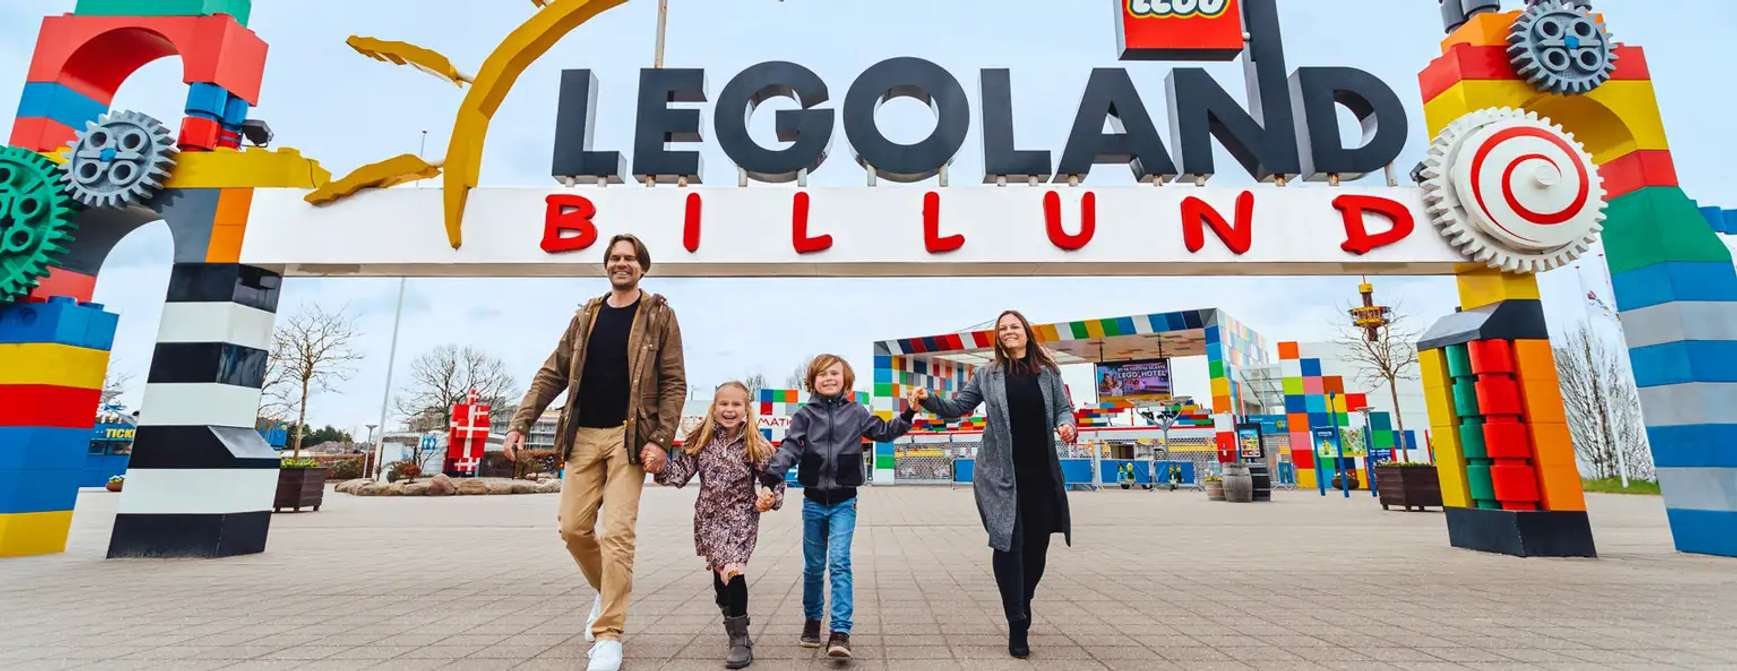 Legoland inngangen til parken